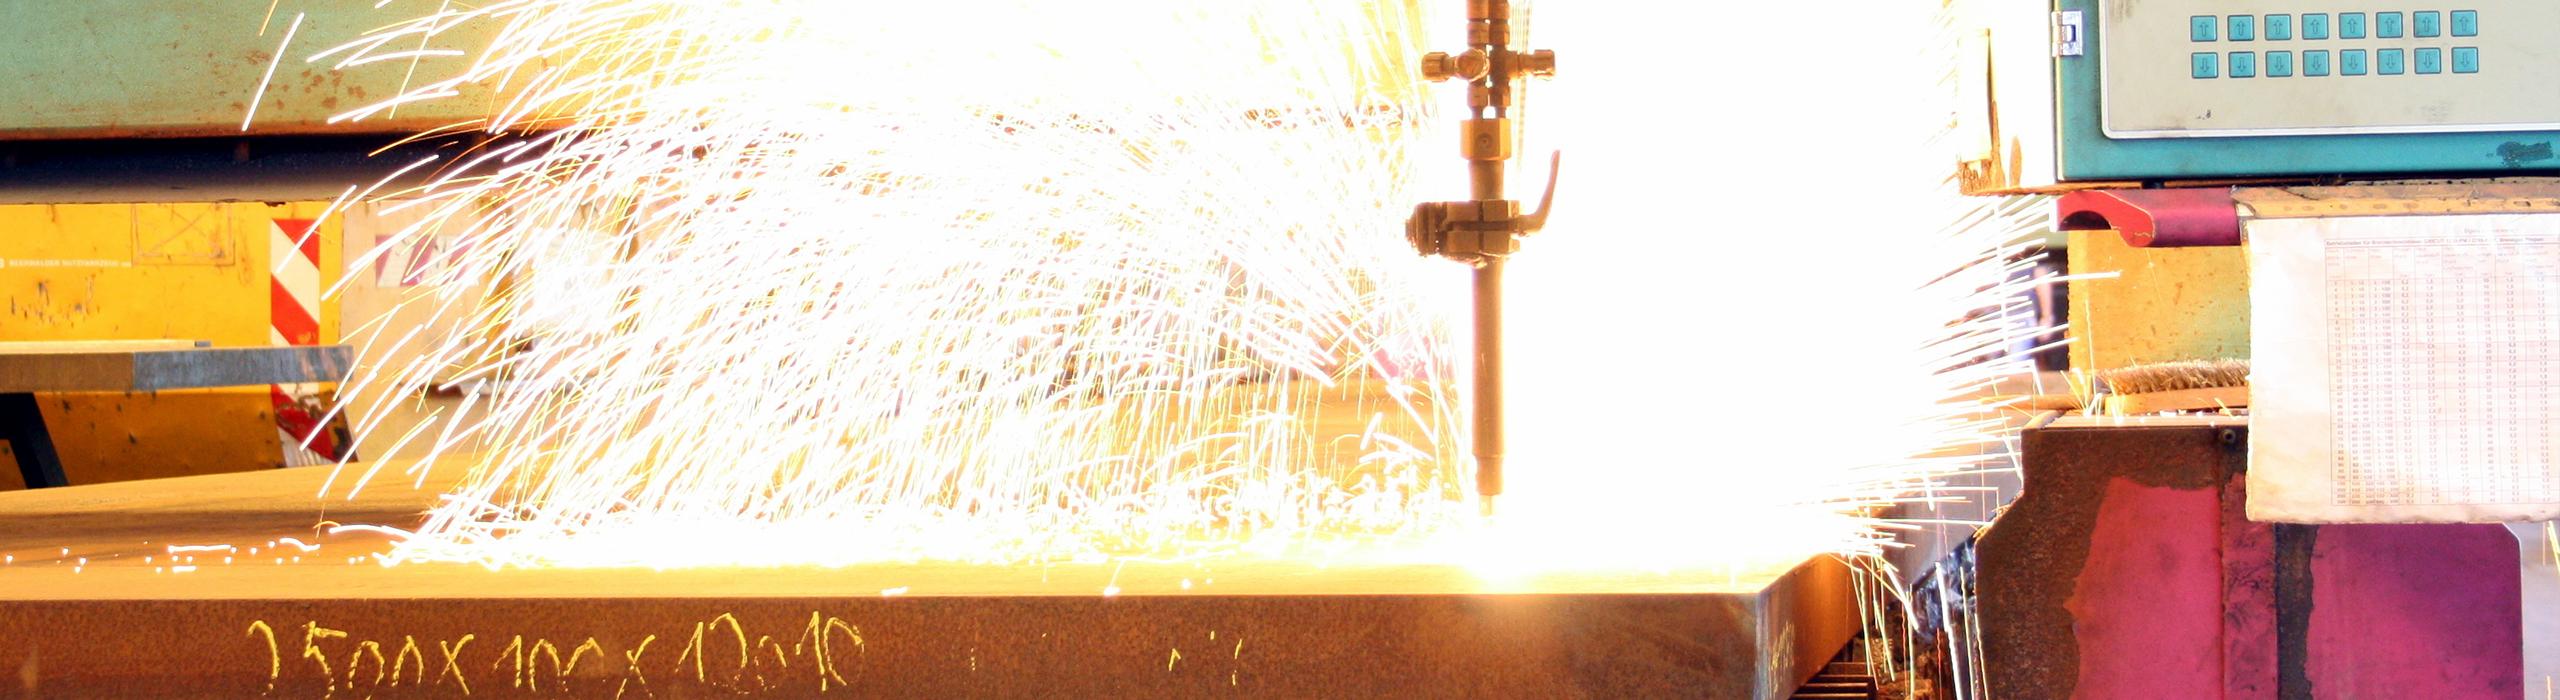 RSB-Stahl-header1-brennbetrieb